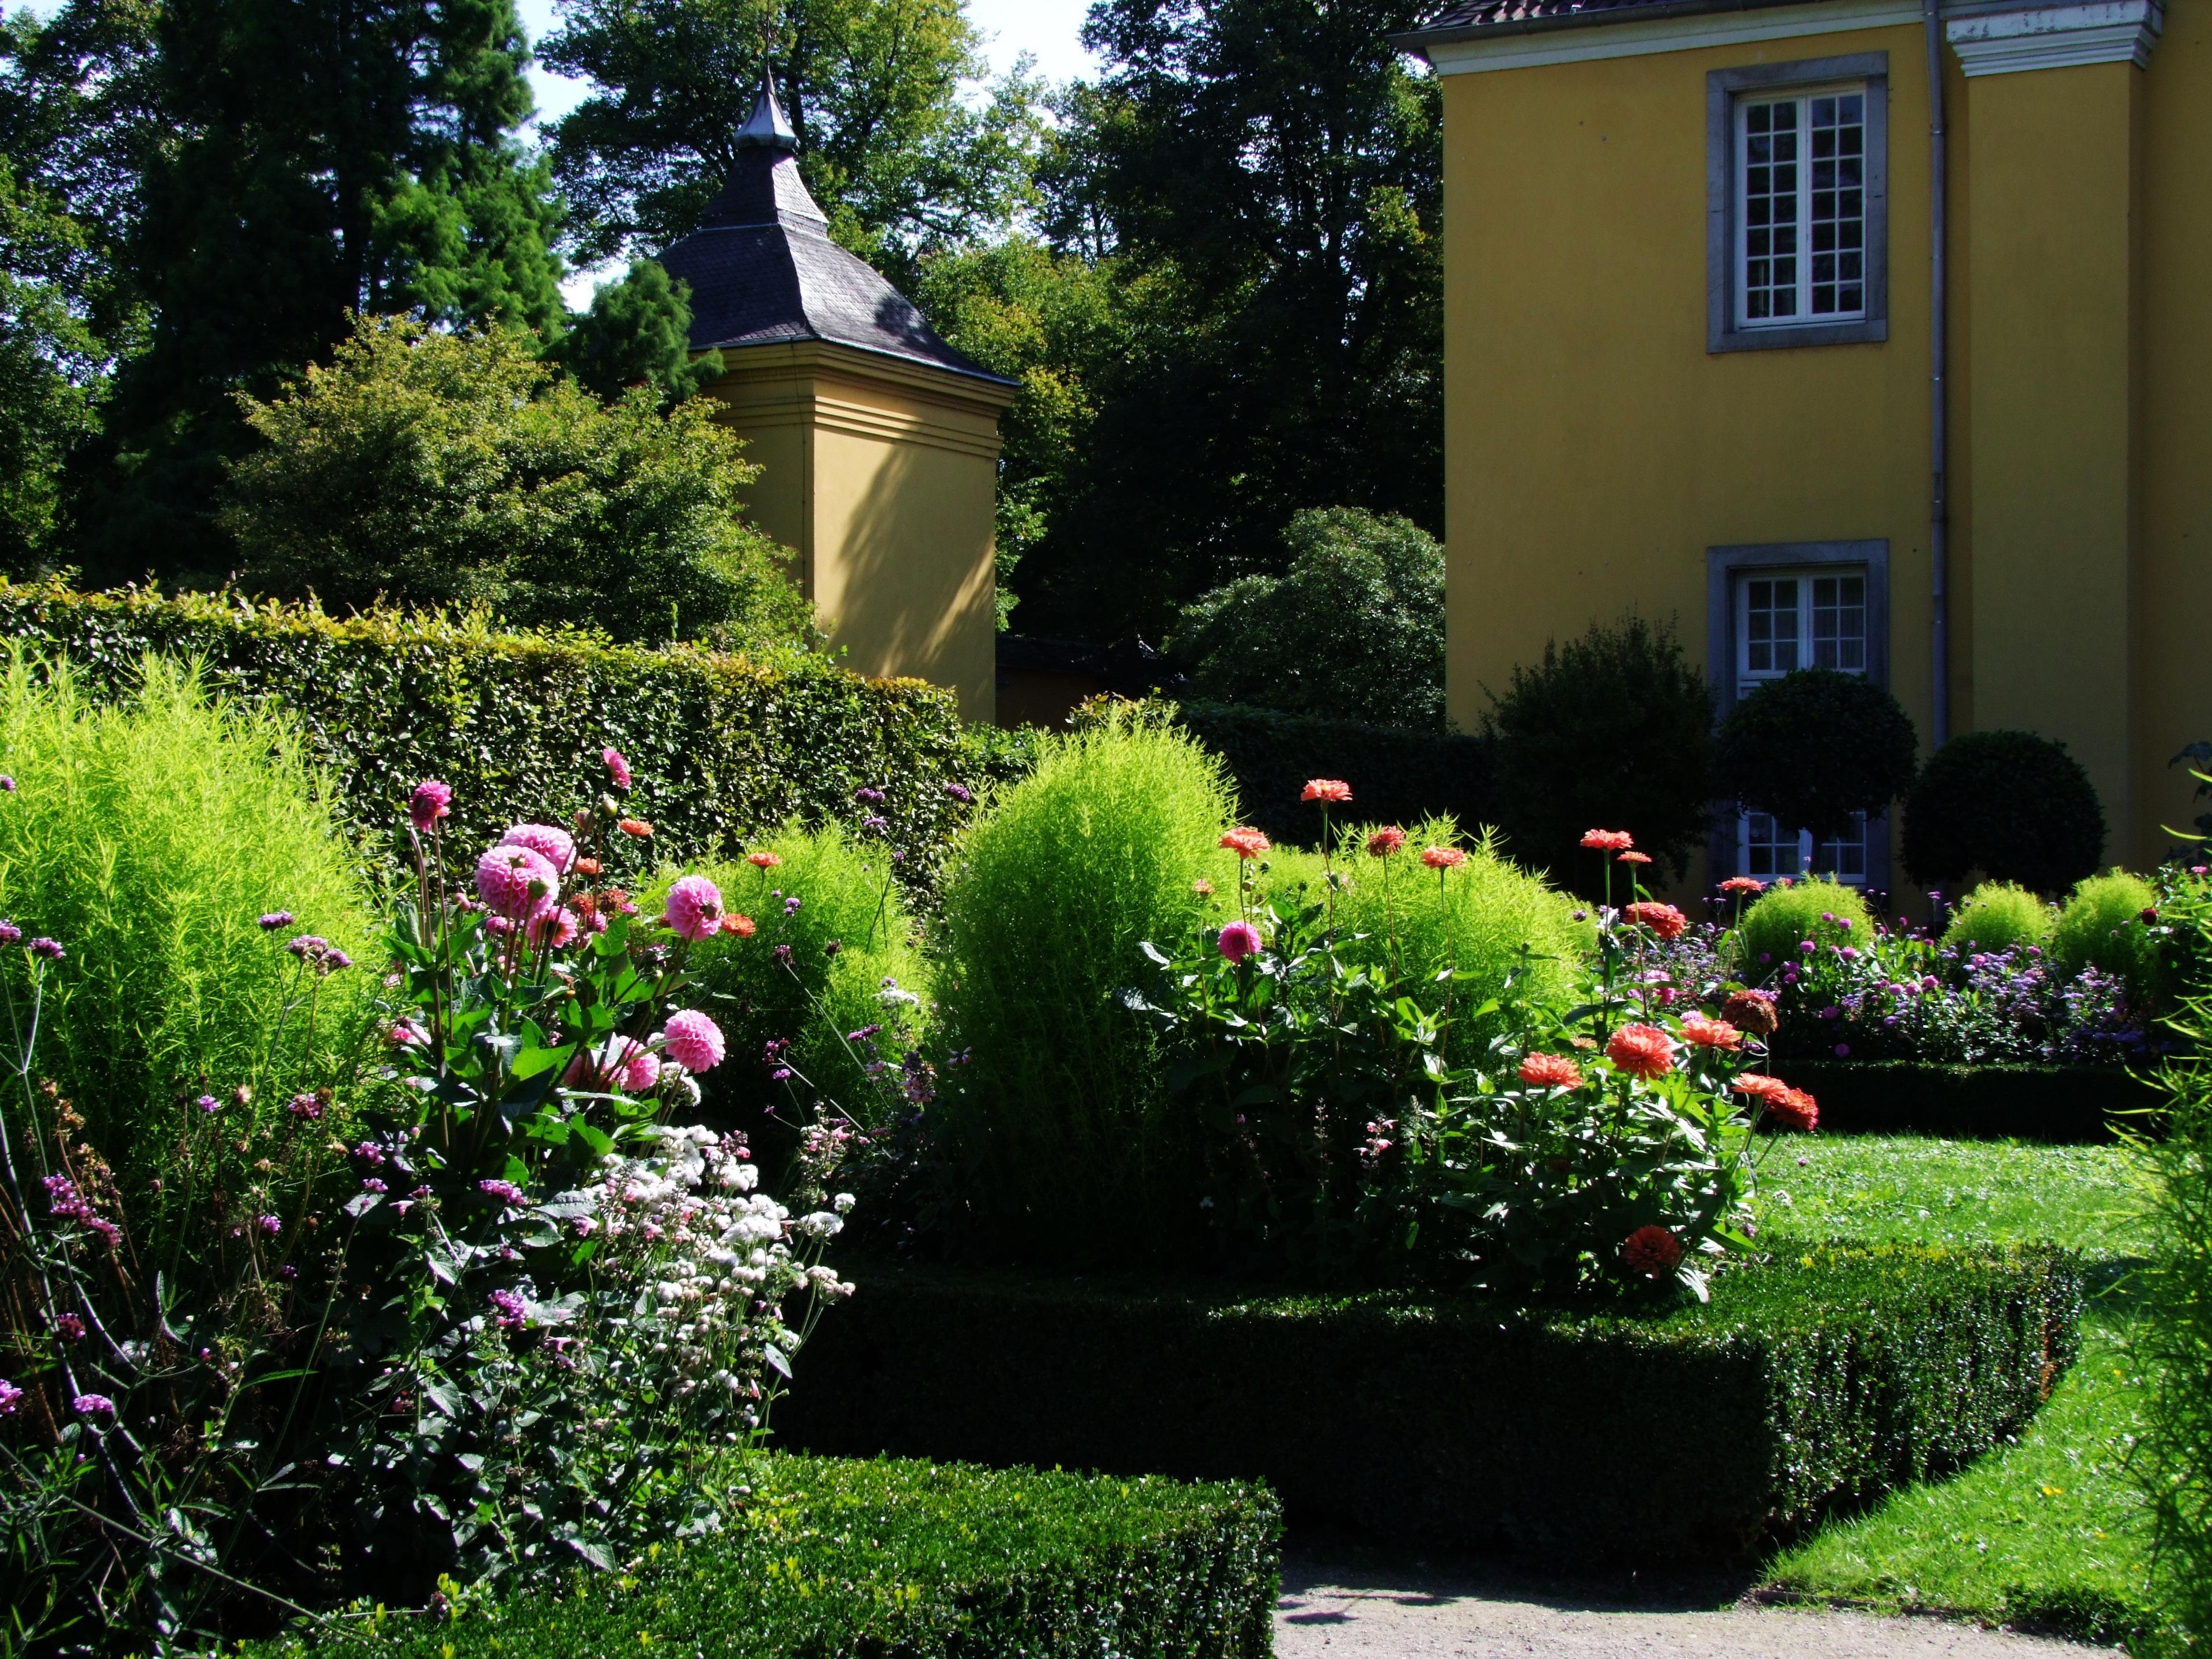 Free Images Lawn Summer Cottage Backyard Property Botany